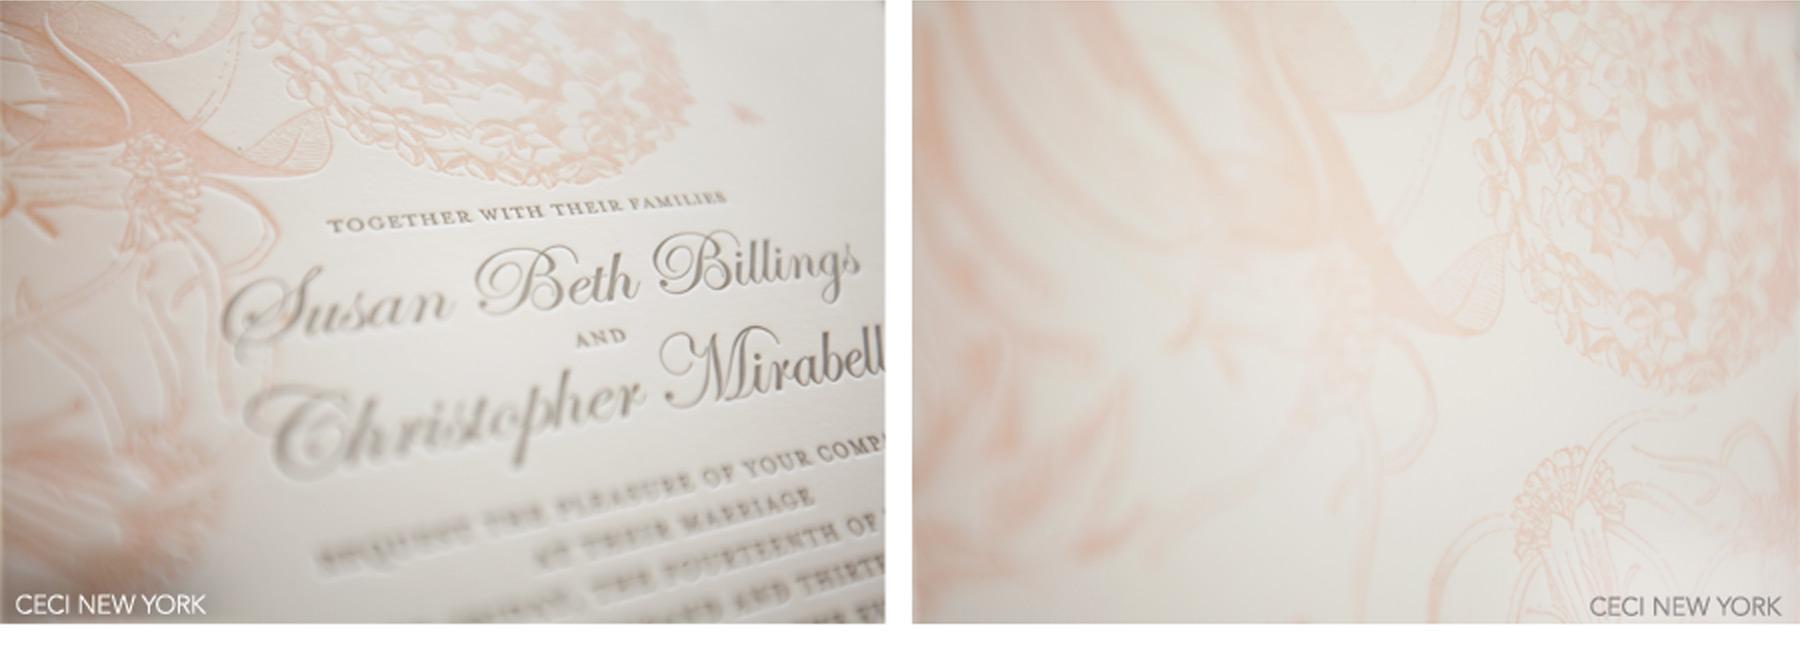 pink_pewter_wedding_letterpress_cape_may_congress_hall_new_jersey_luxury_invitation_v203_om_1b.jpg